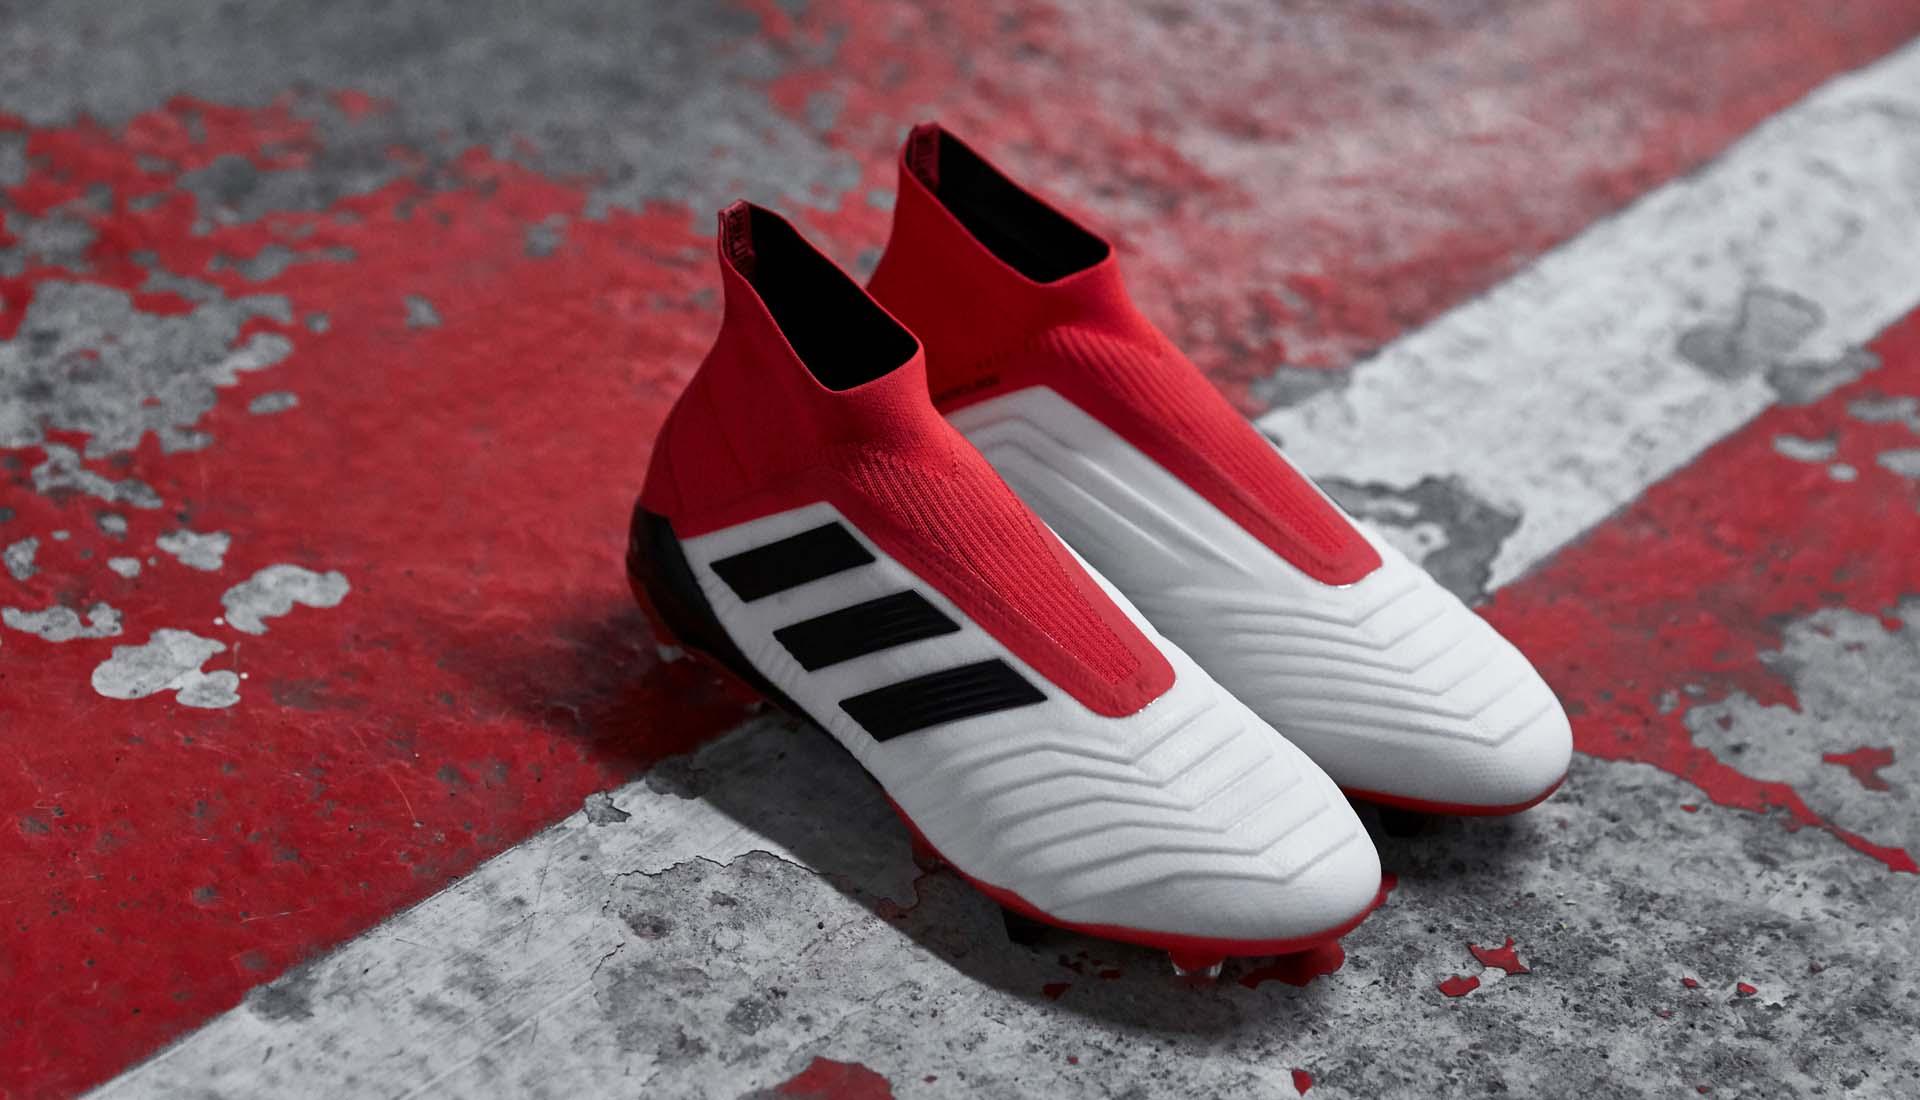 Adidas Predator Tango 18.1 TR 'Cold Blooded' Black